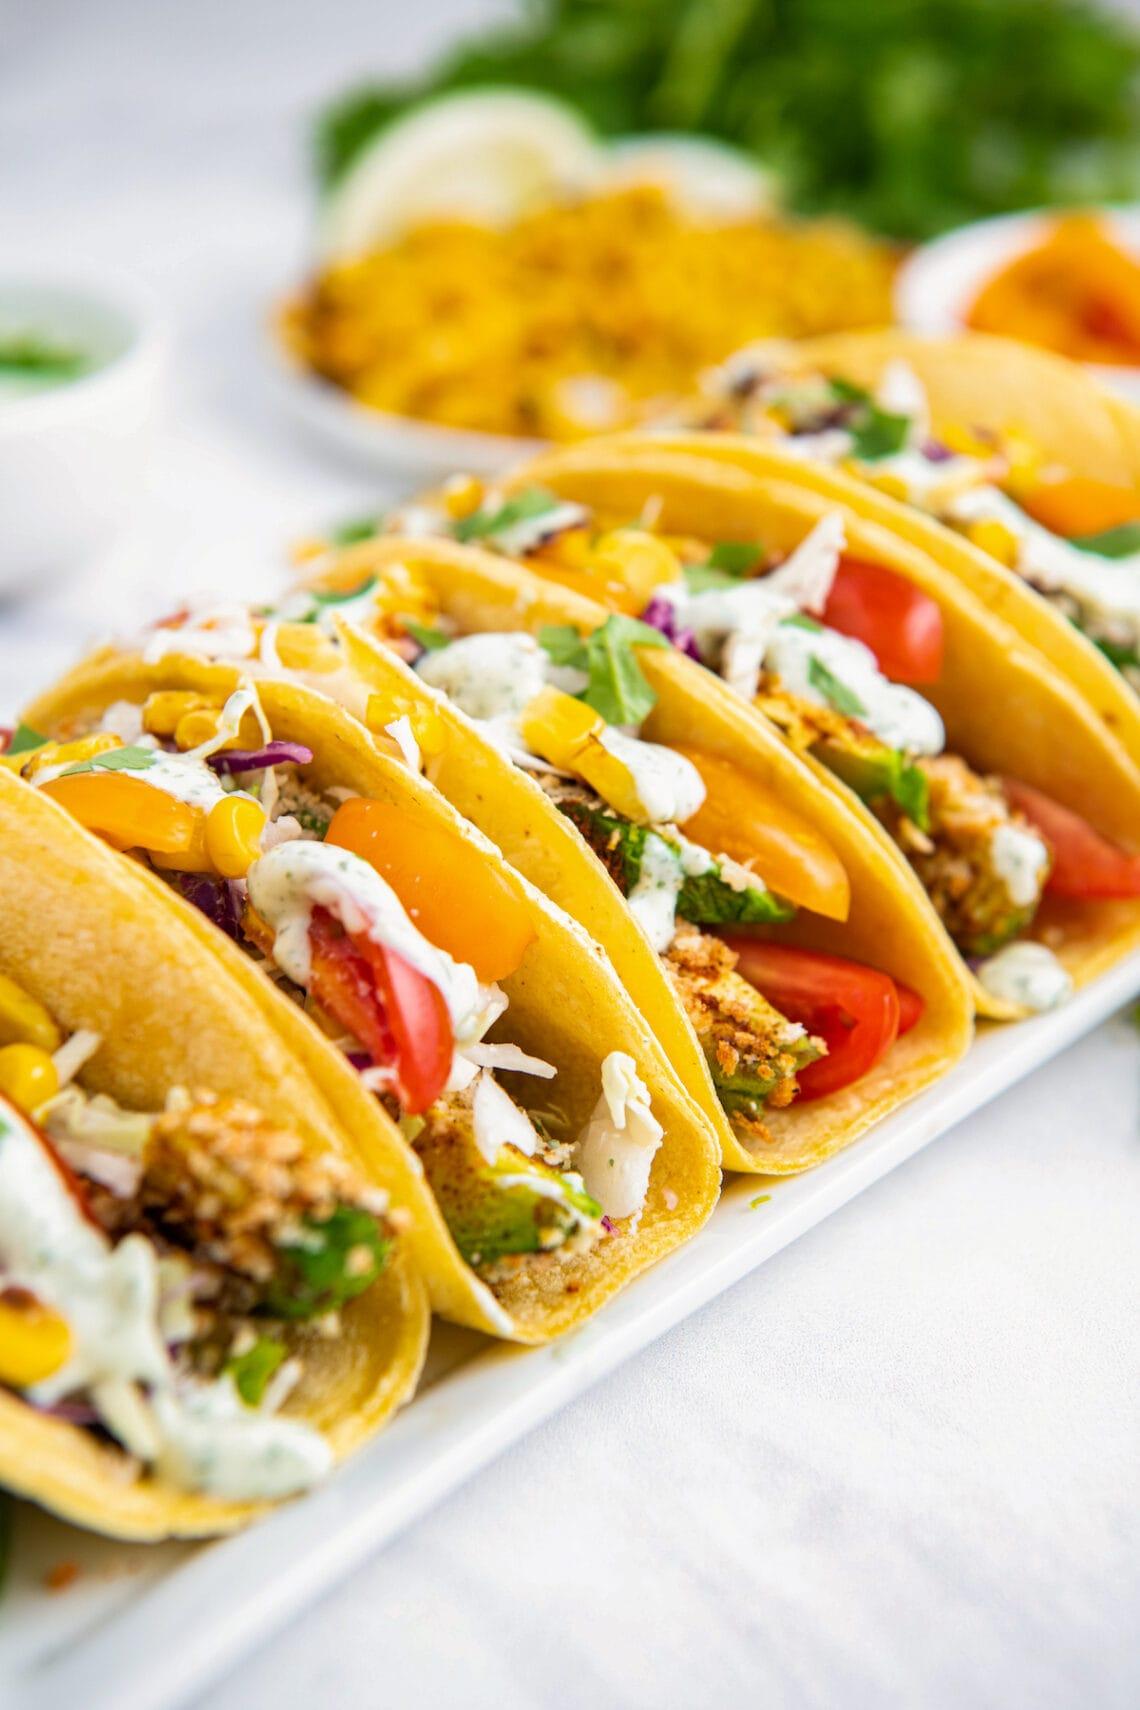 Avocado tacos on a white plate